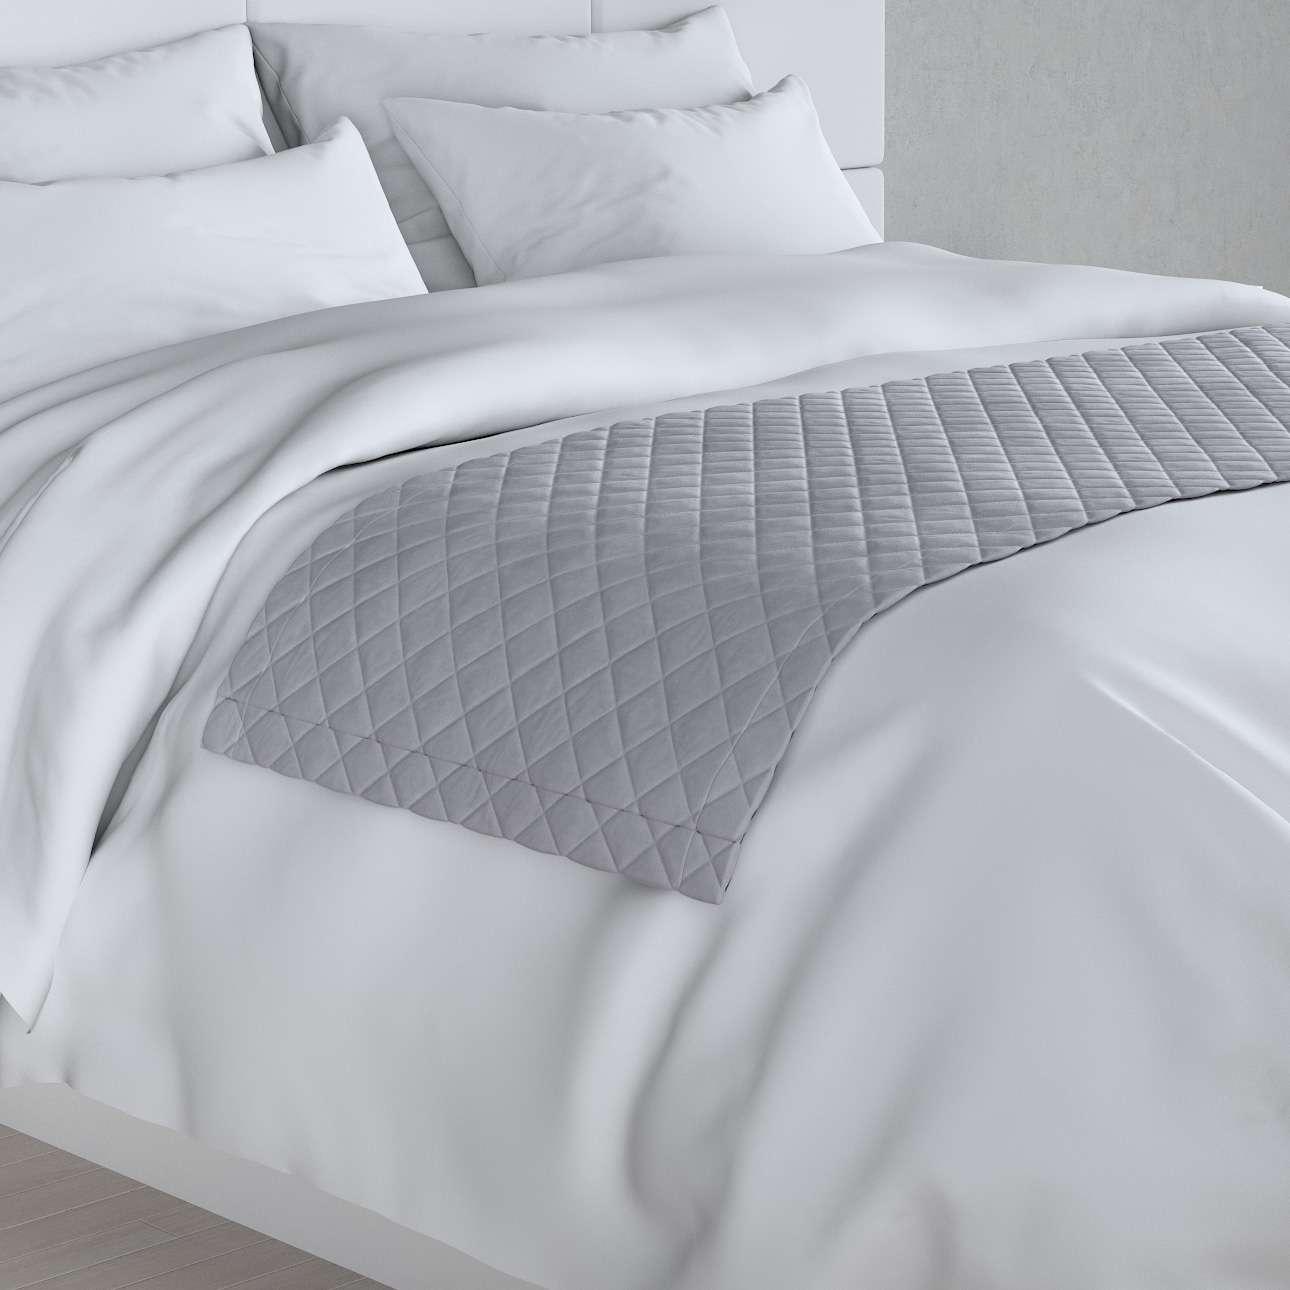 Narzuta hotelowa bieżnik Velvet 60x200cm w kolekcji Velvet, tkanina: 704-24